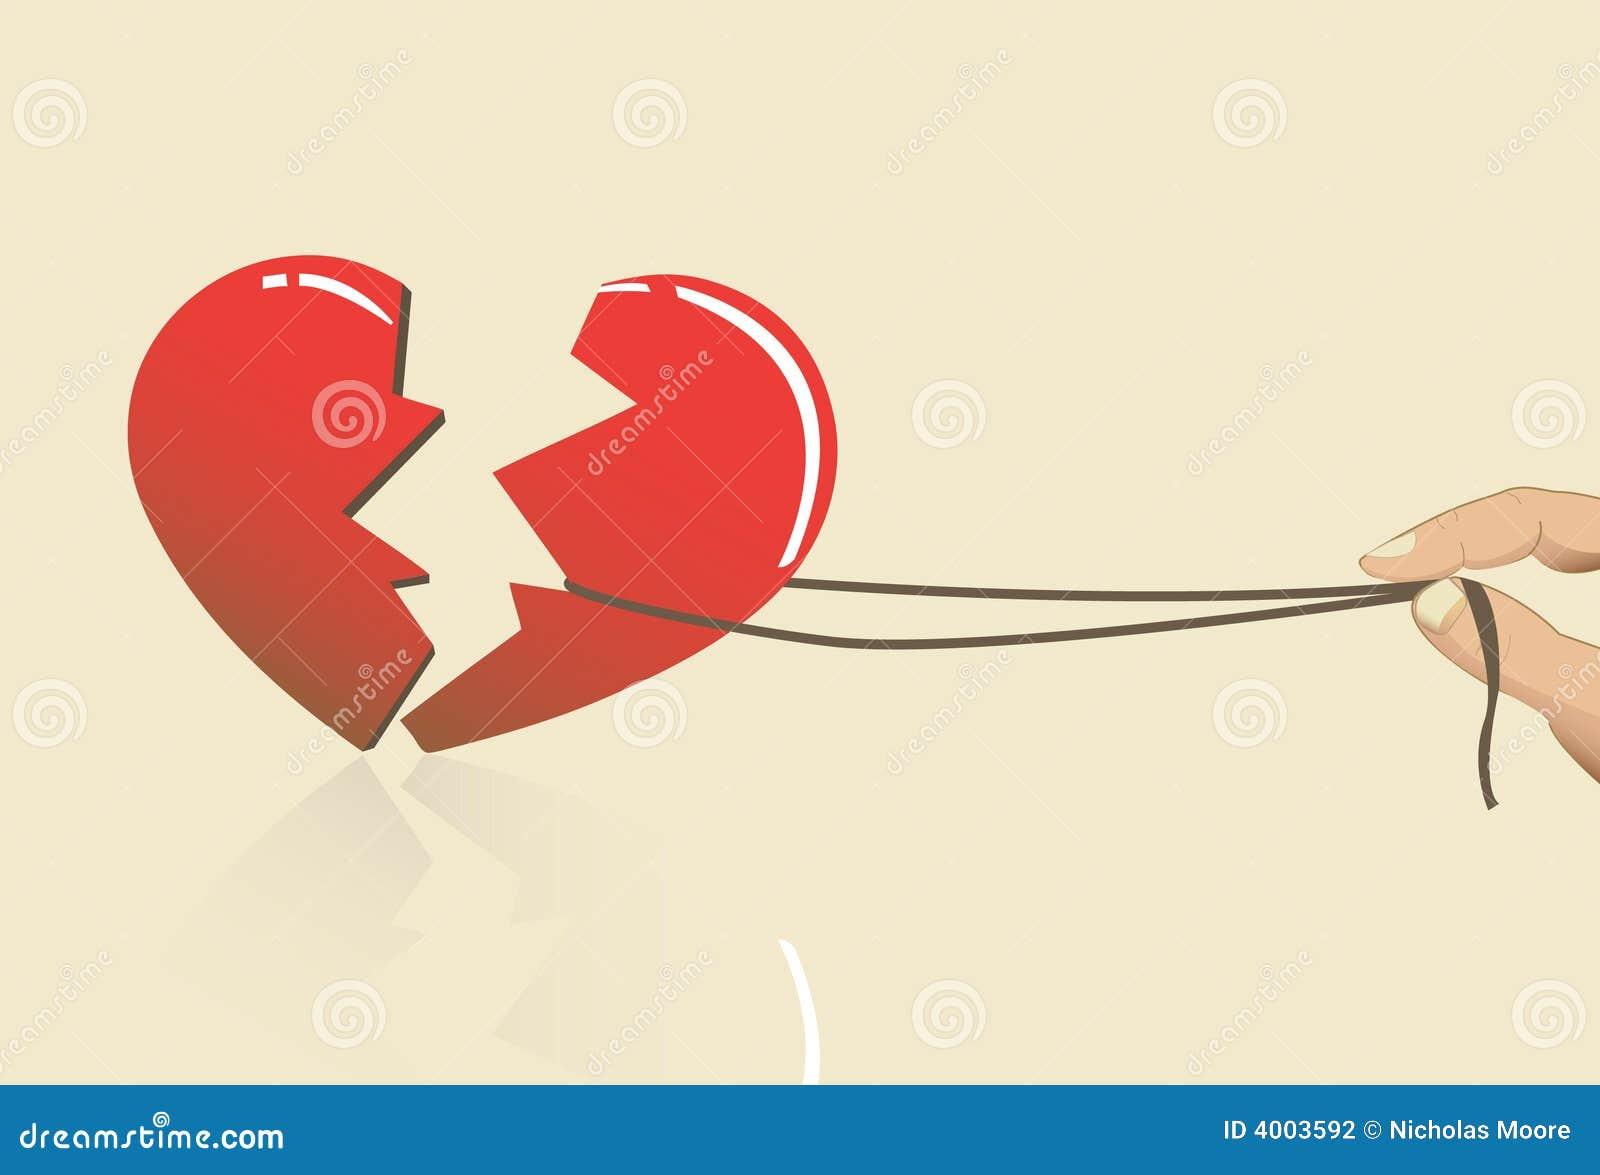 half hand heart gallery - photo #29